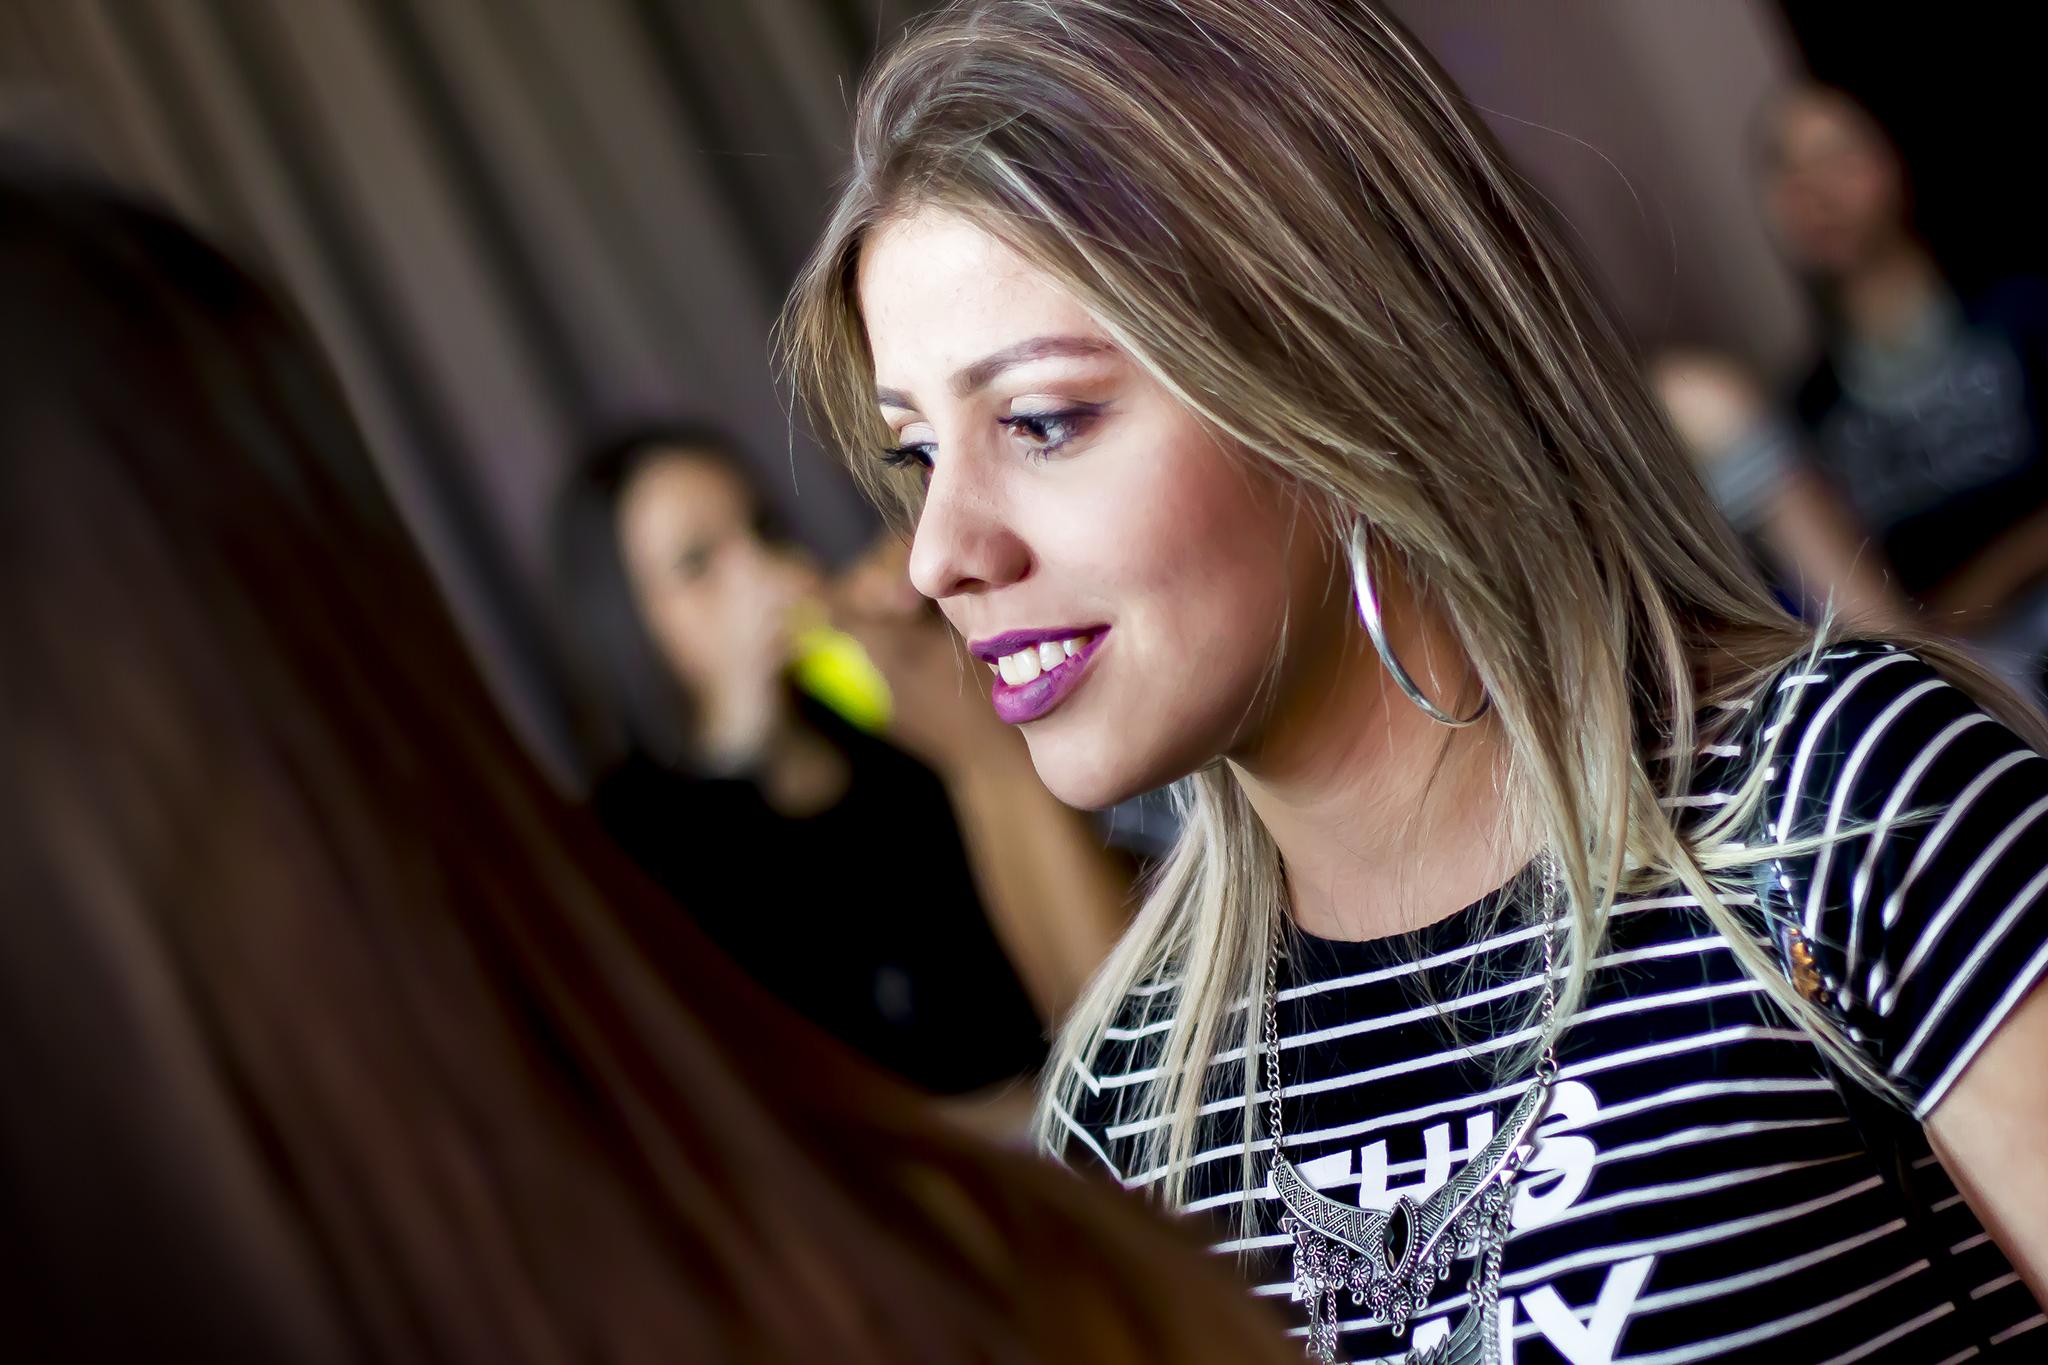 Bikini 28.10.2016-Kenzi Marinho-revista-backstages-bikini-club (21)